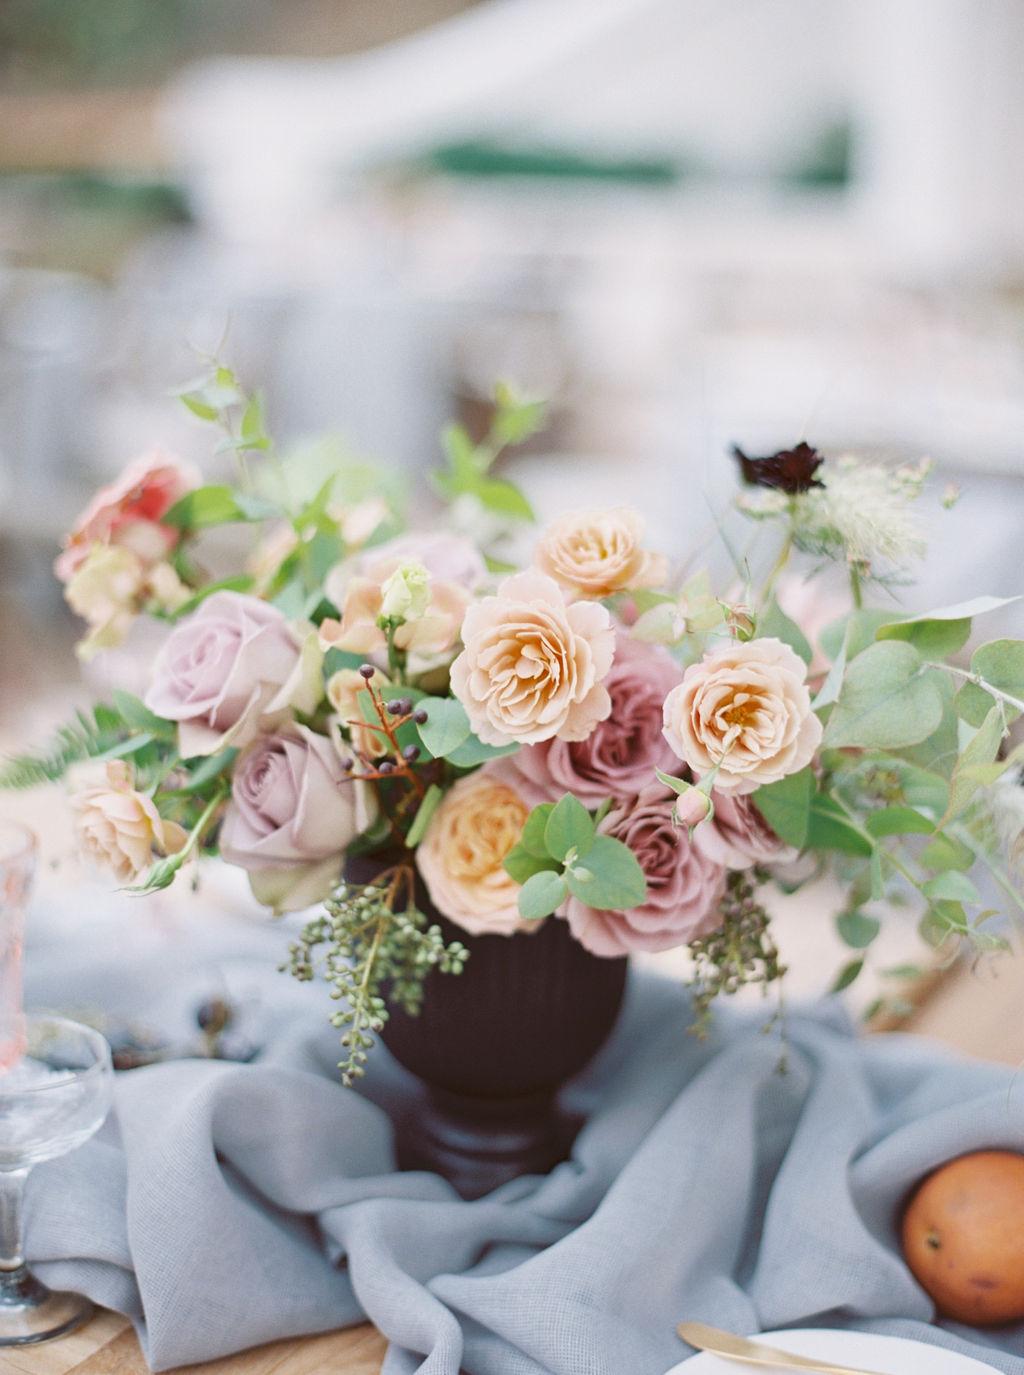 Garden Roses Centerpiece by Finding Flora